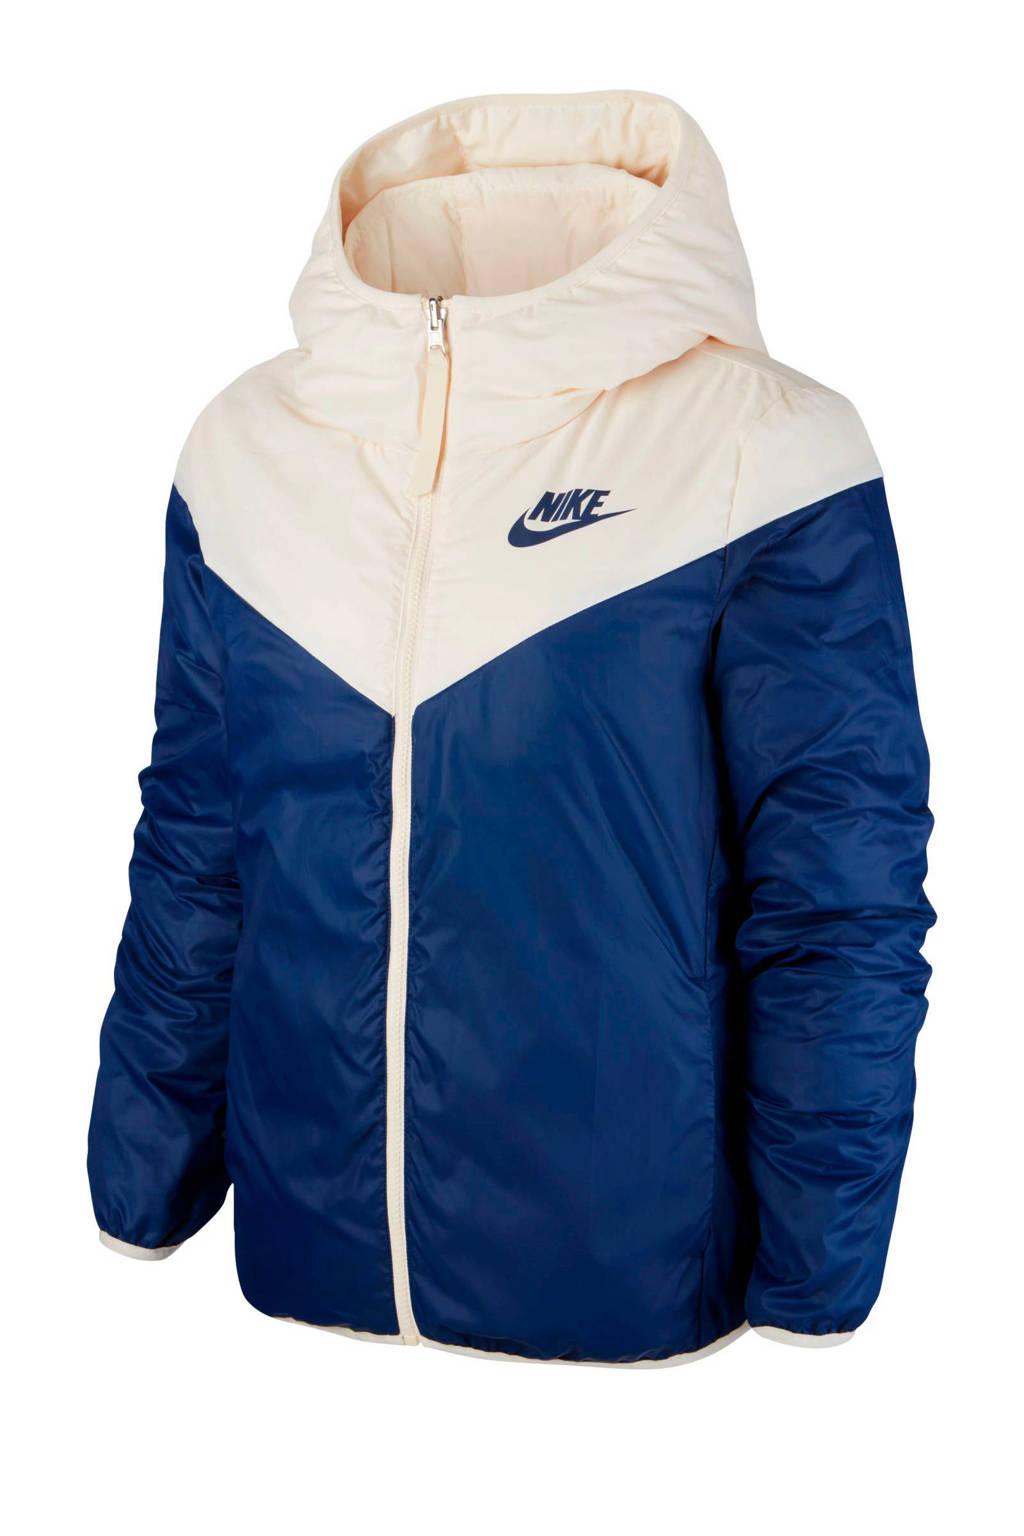 Nike jas reversible wit/blauw, Wit/blauw